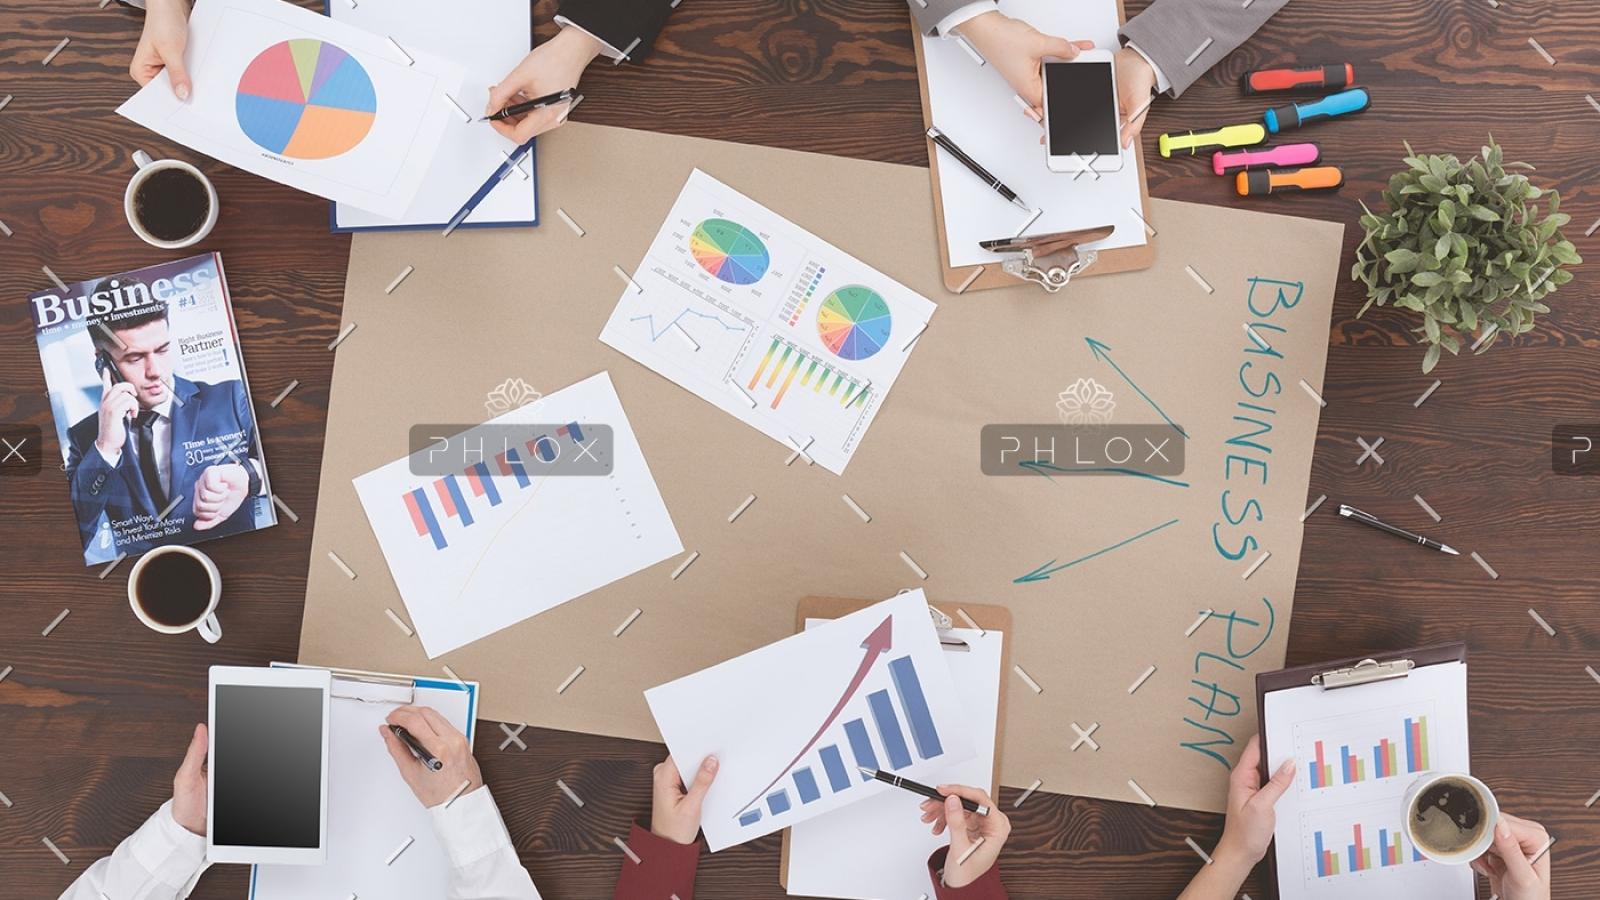 people-preparing-business-plan-PMM9WH8-1